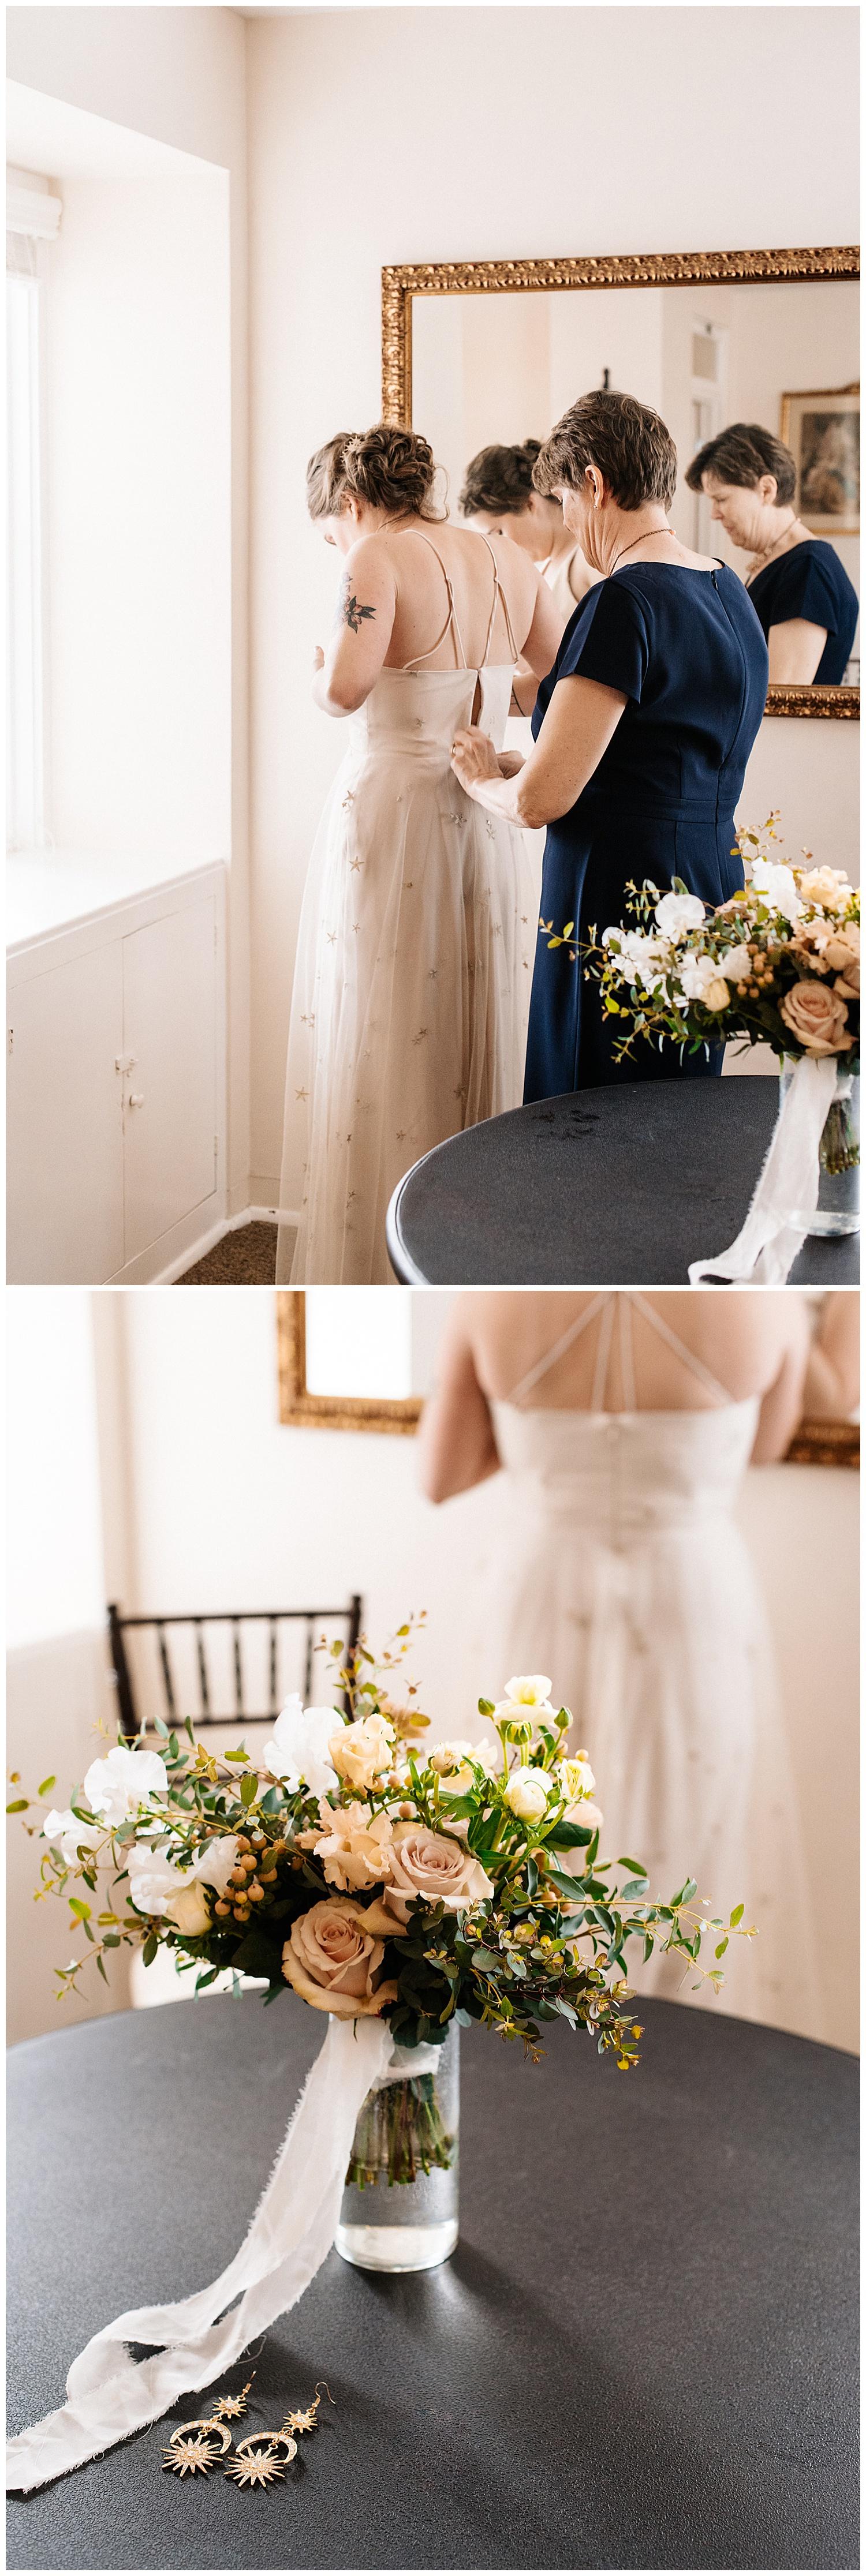 SamEricaStudios - San Diego Wedding Photographer - Galaxy Themed Rainy Day Wedding Parq West San Diego_0016.jpg